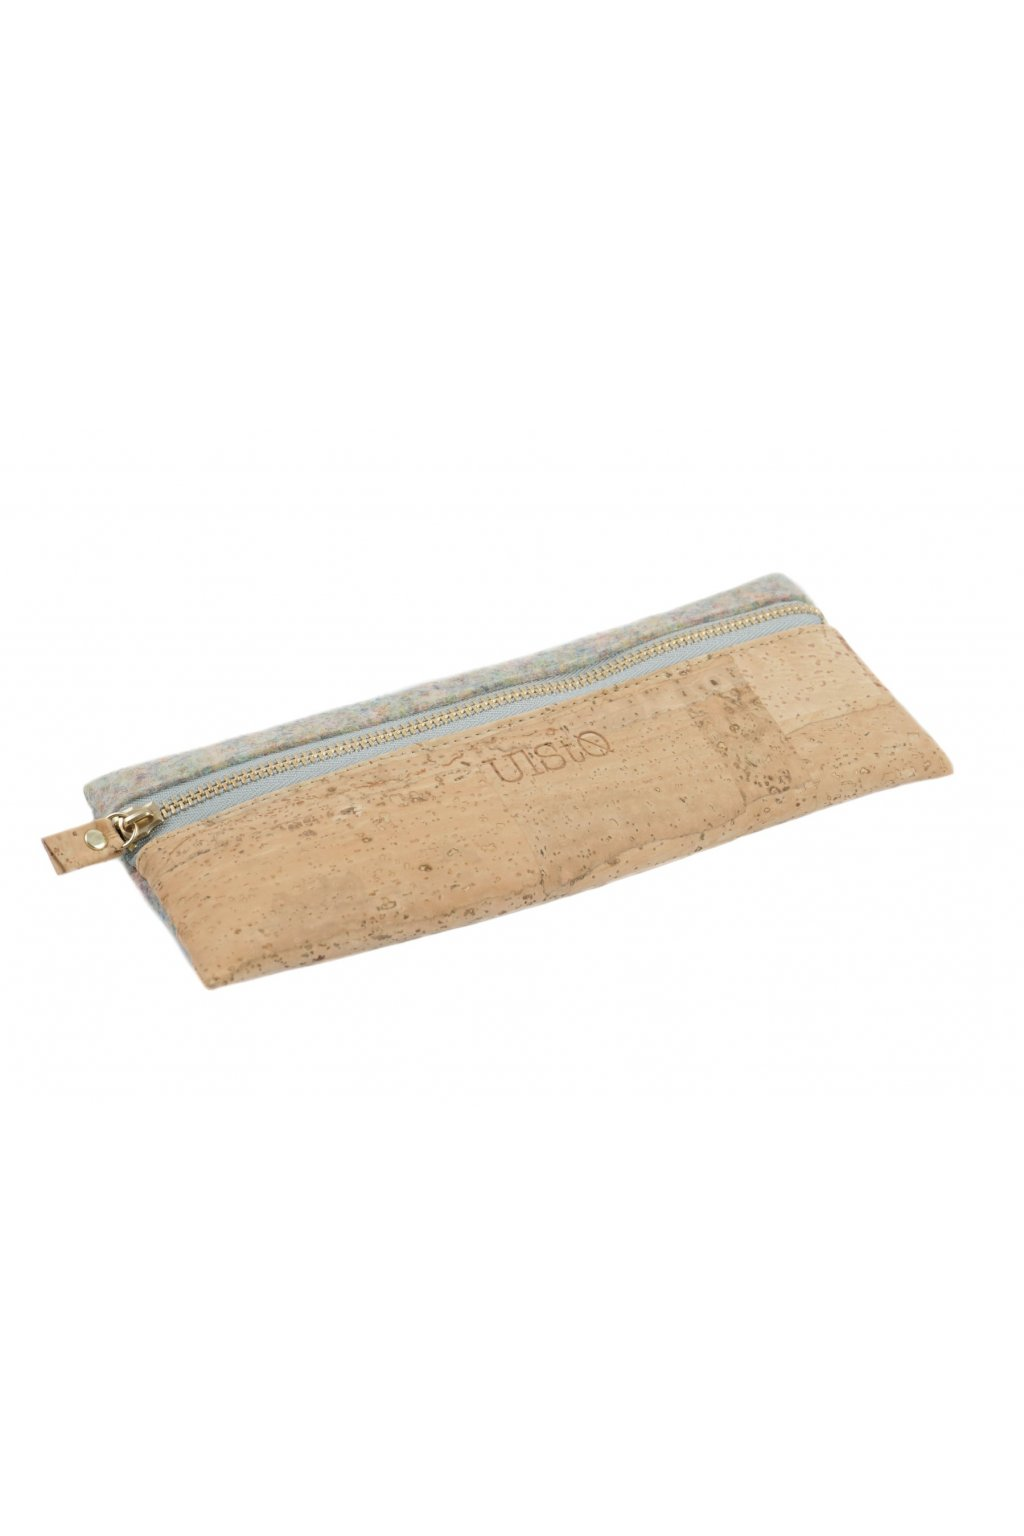 UlStO Taschen Accessoires Kork Filz 12 1800x1199